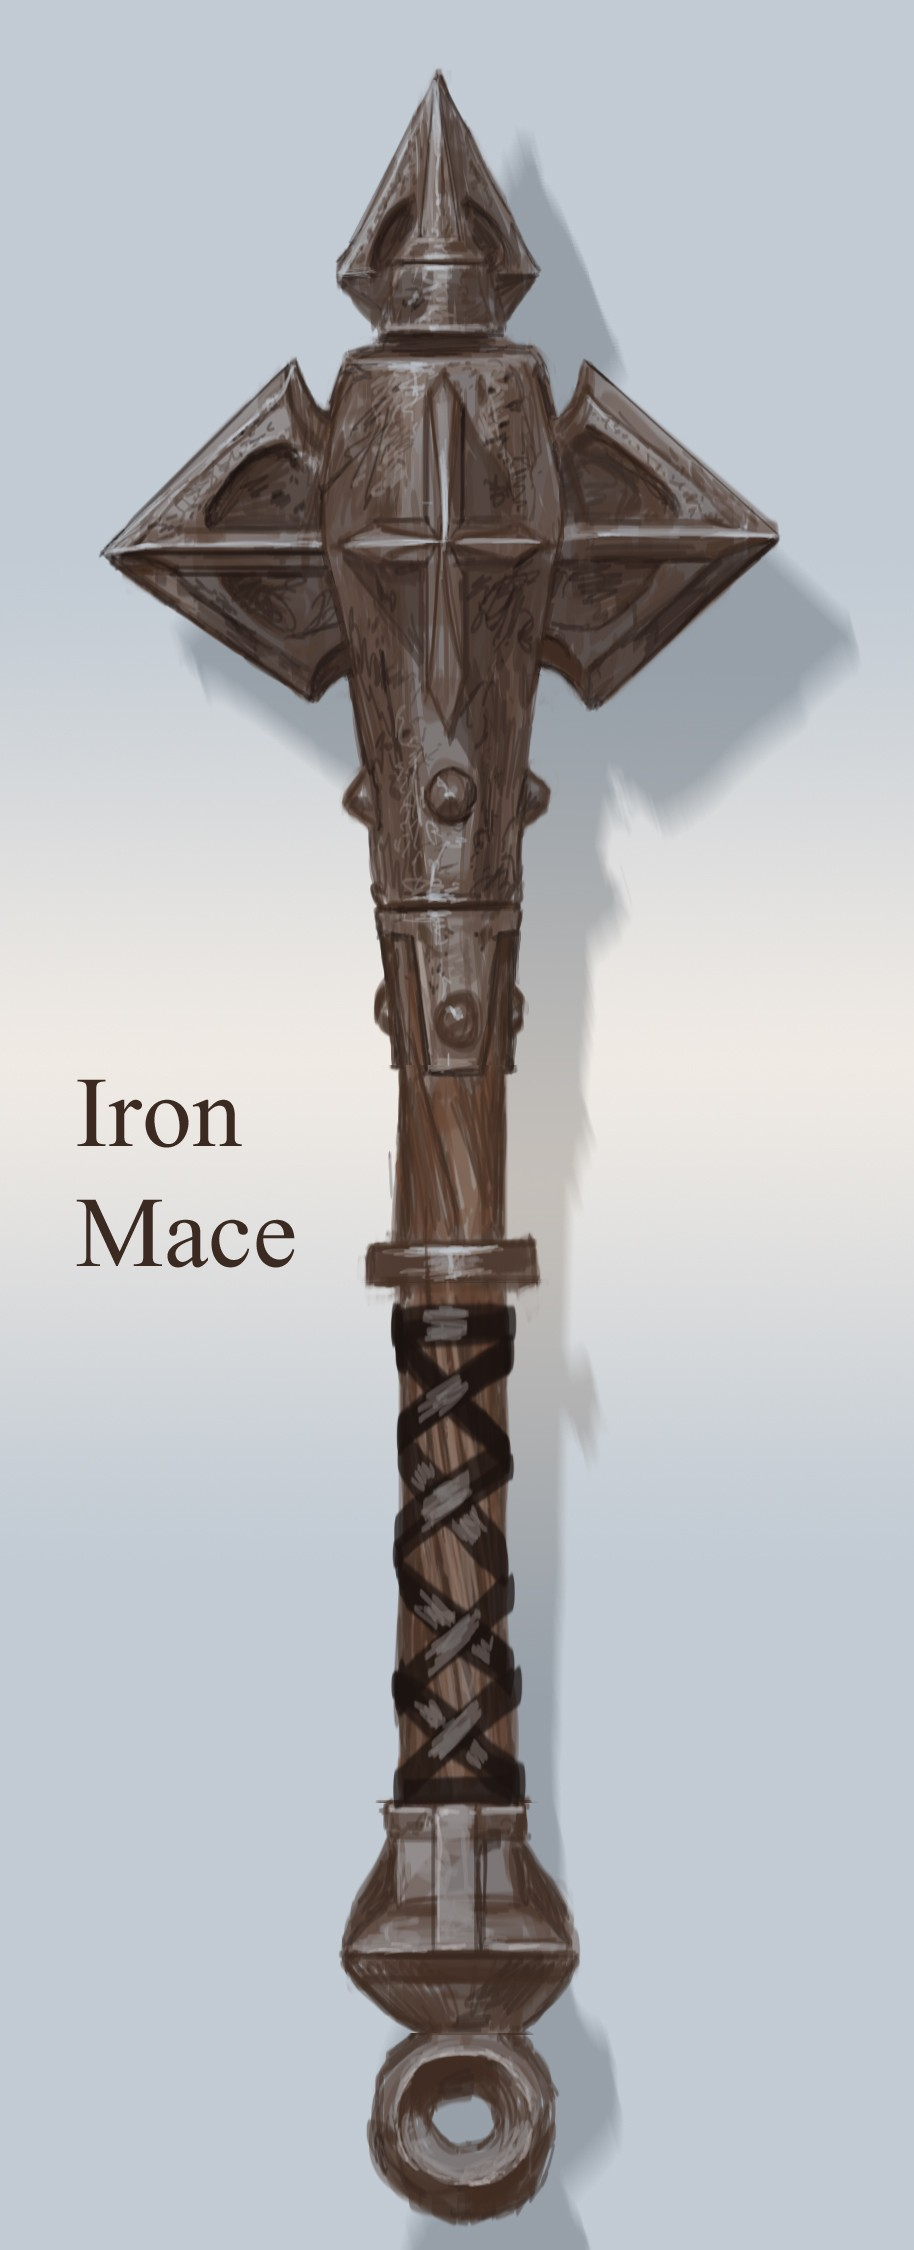 Fichier:Iron Mace.jpg